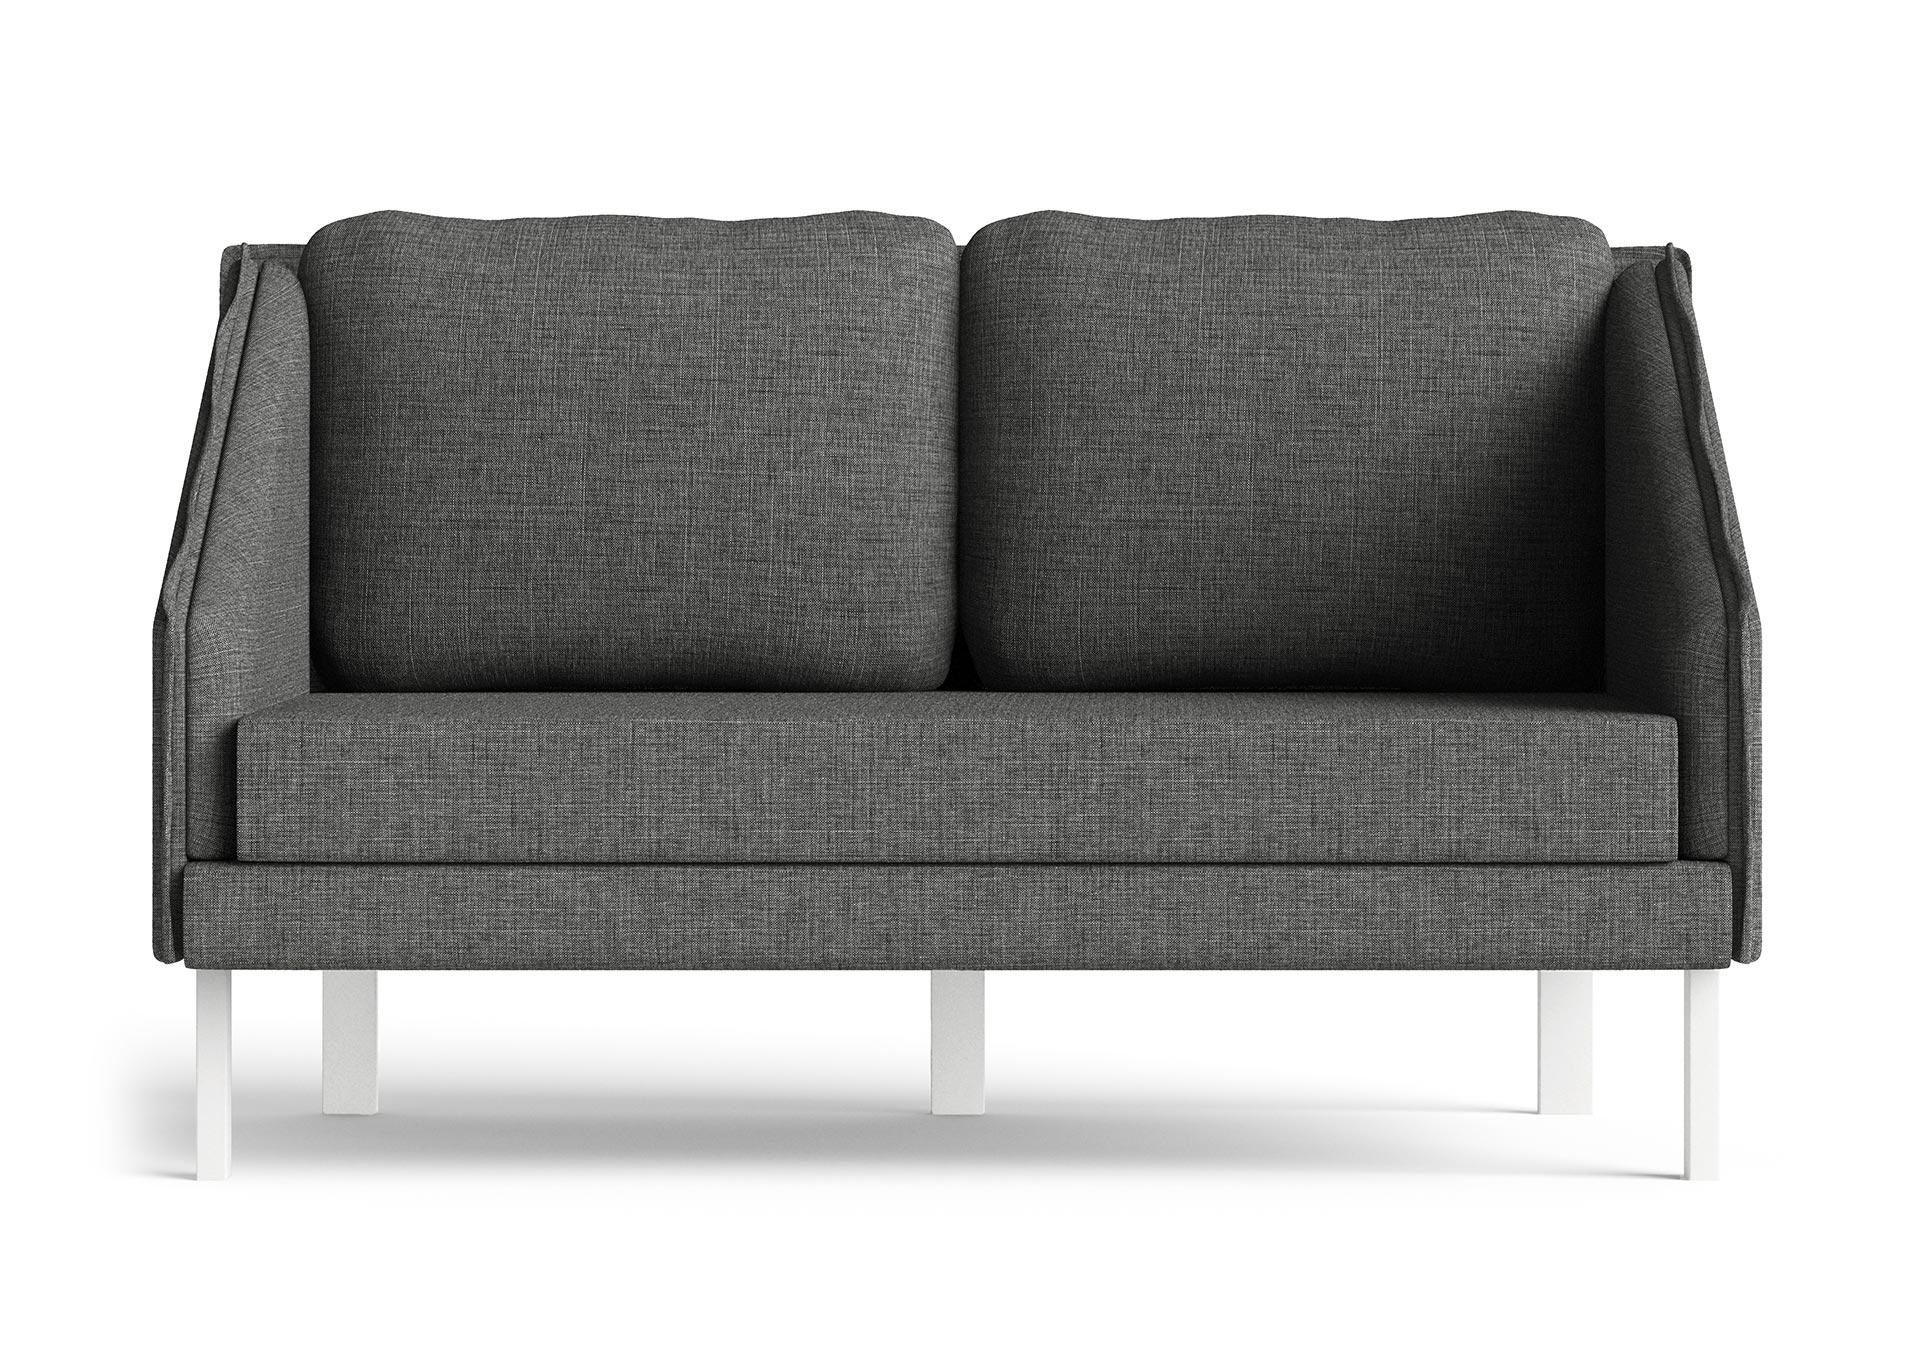 Tracey Small Sofa Furniture CGI Front View Dark Grey